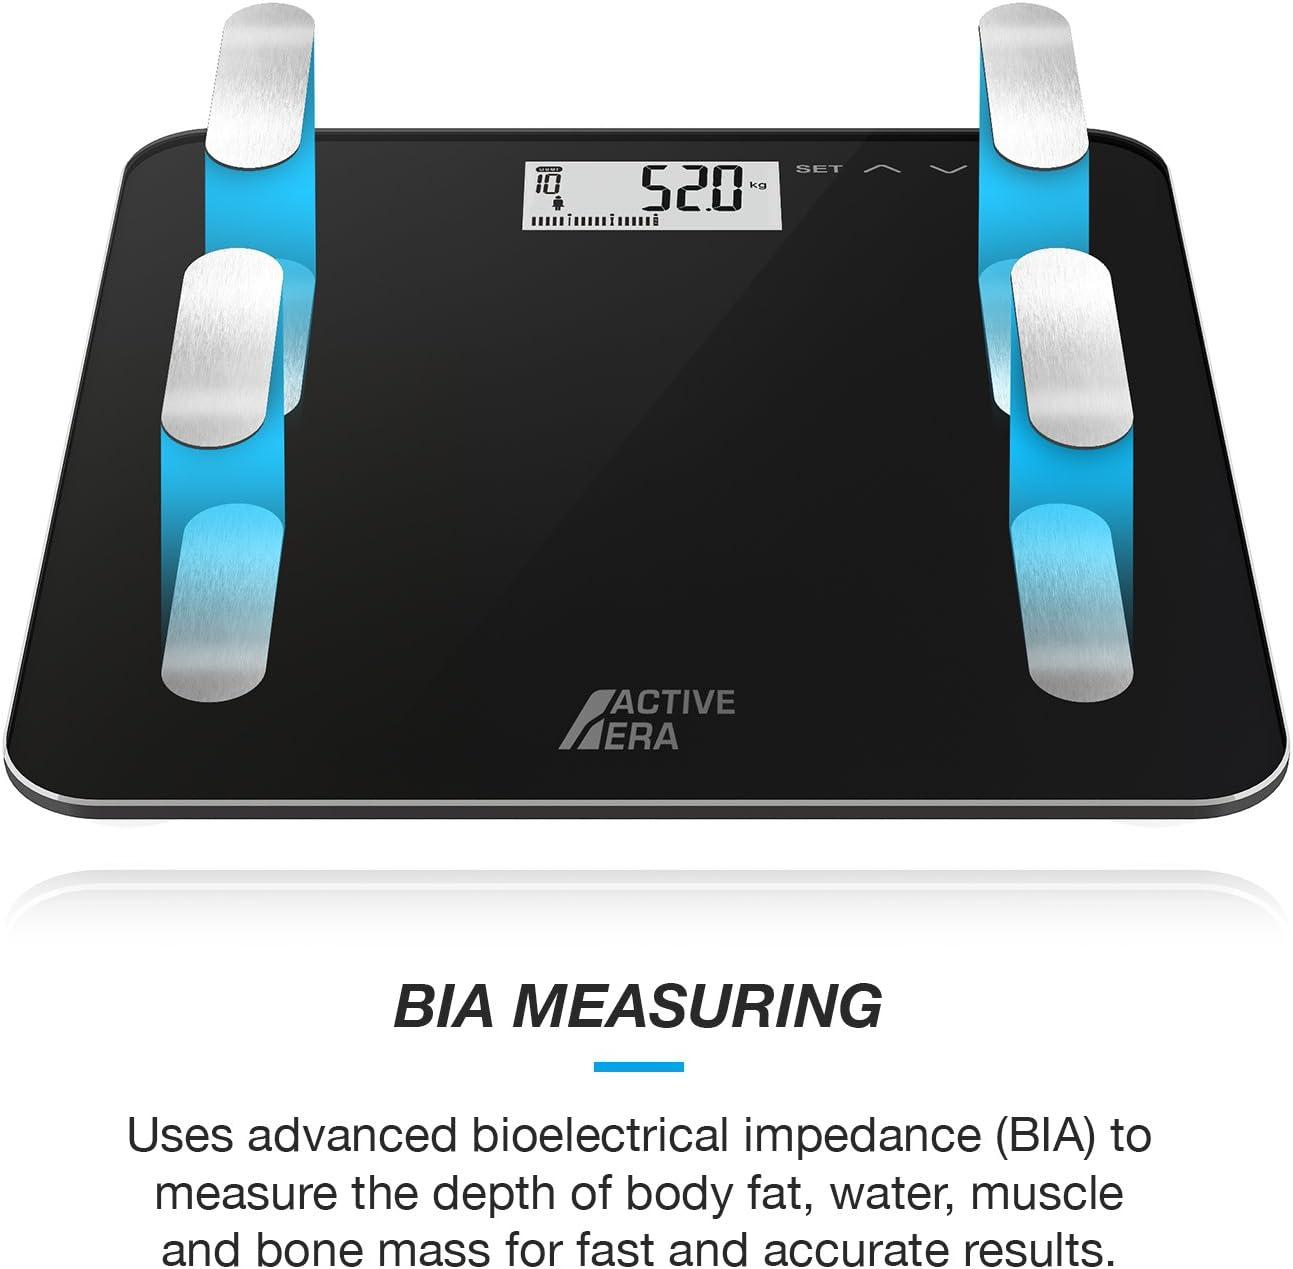 Active Era Bilancia Diagnostica Pesapersone Digitale e Tecnologia Step On e BIA